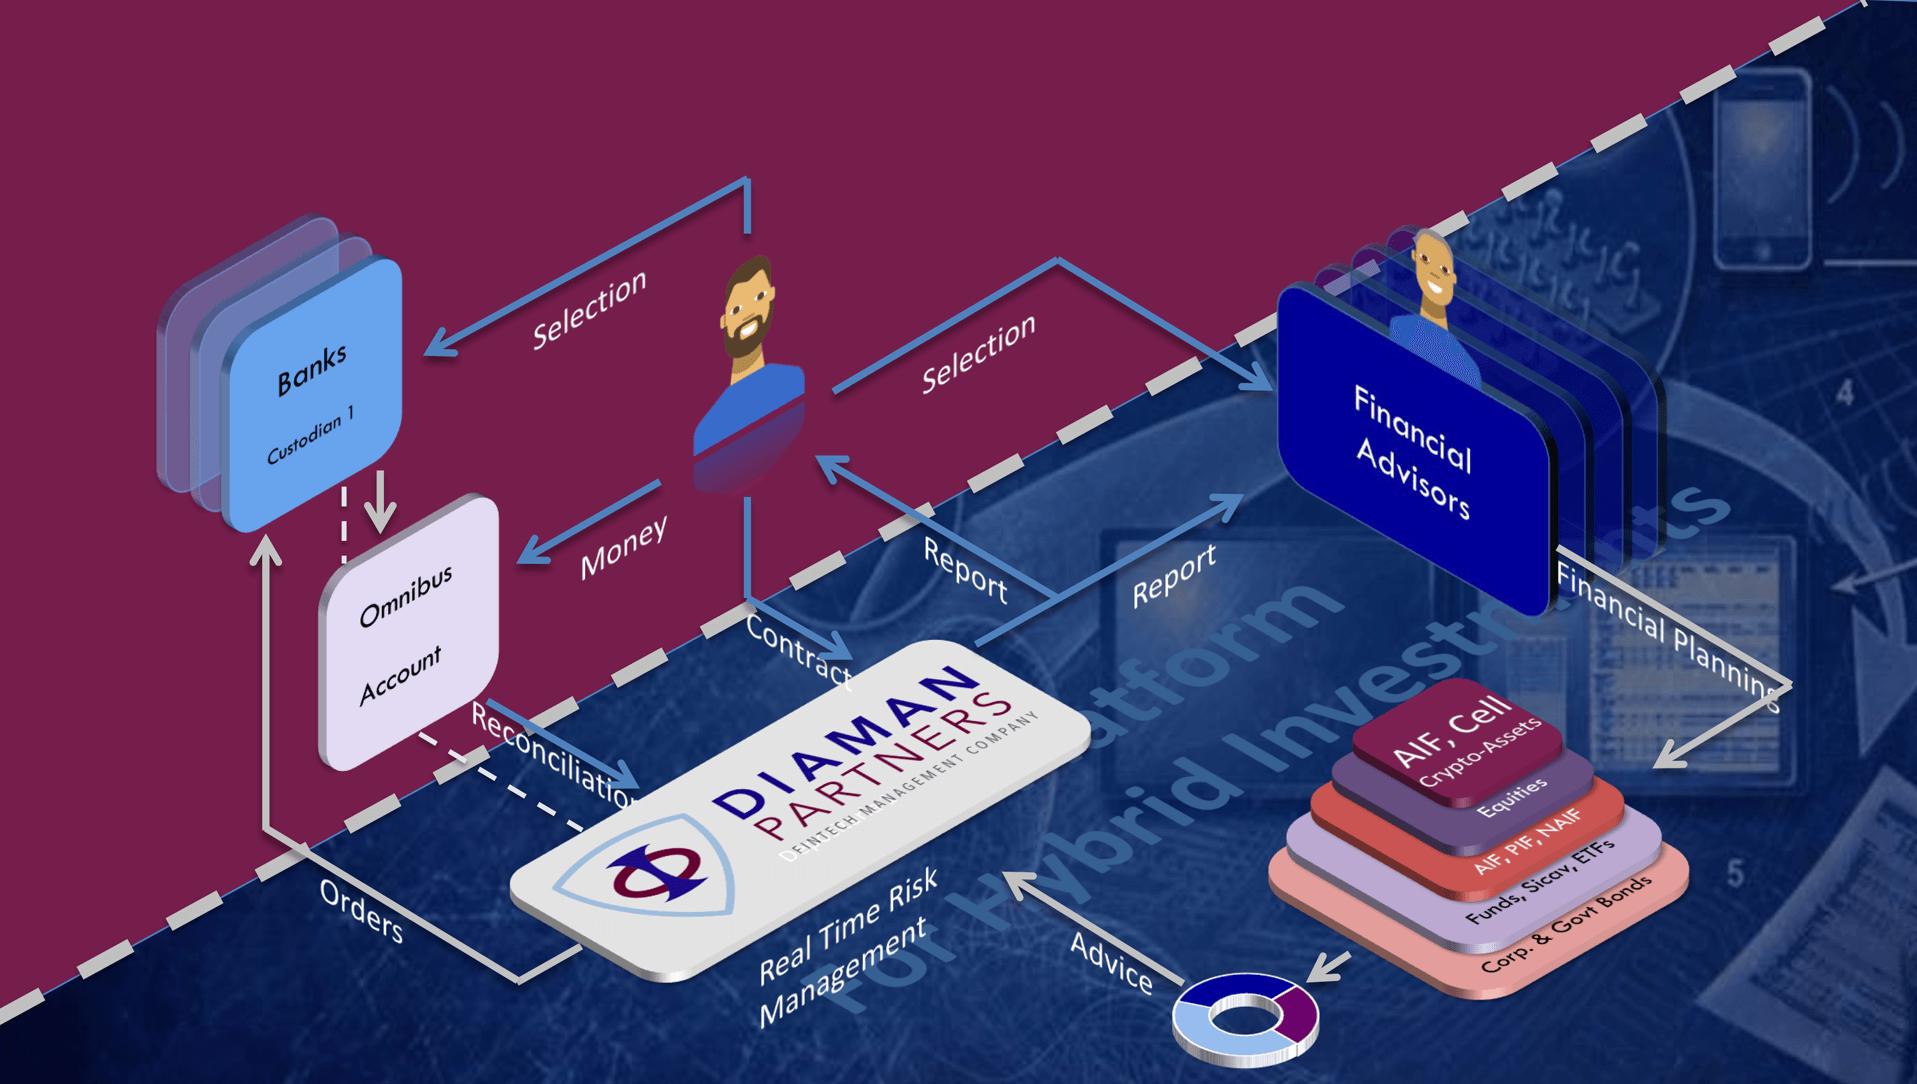 diaman_partners_logo.png